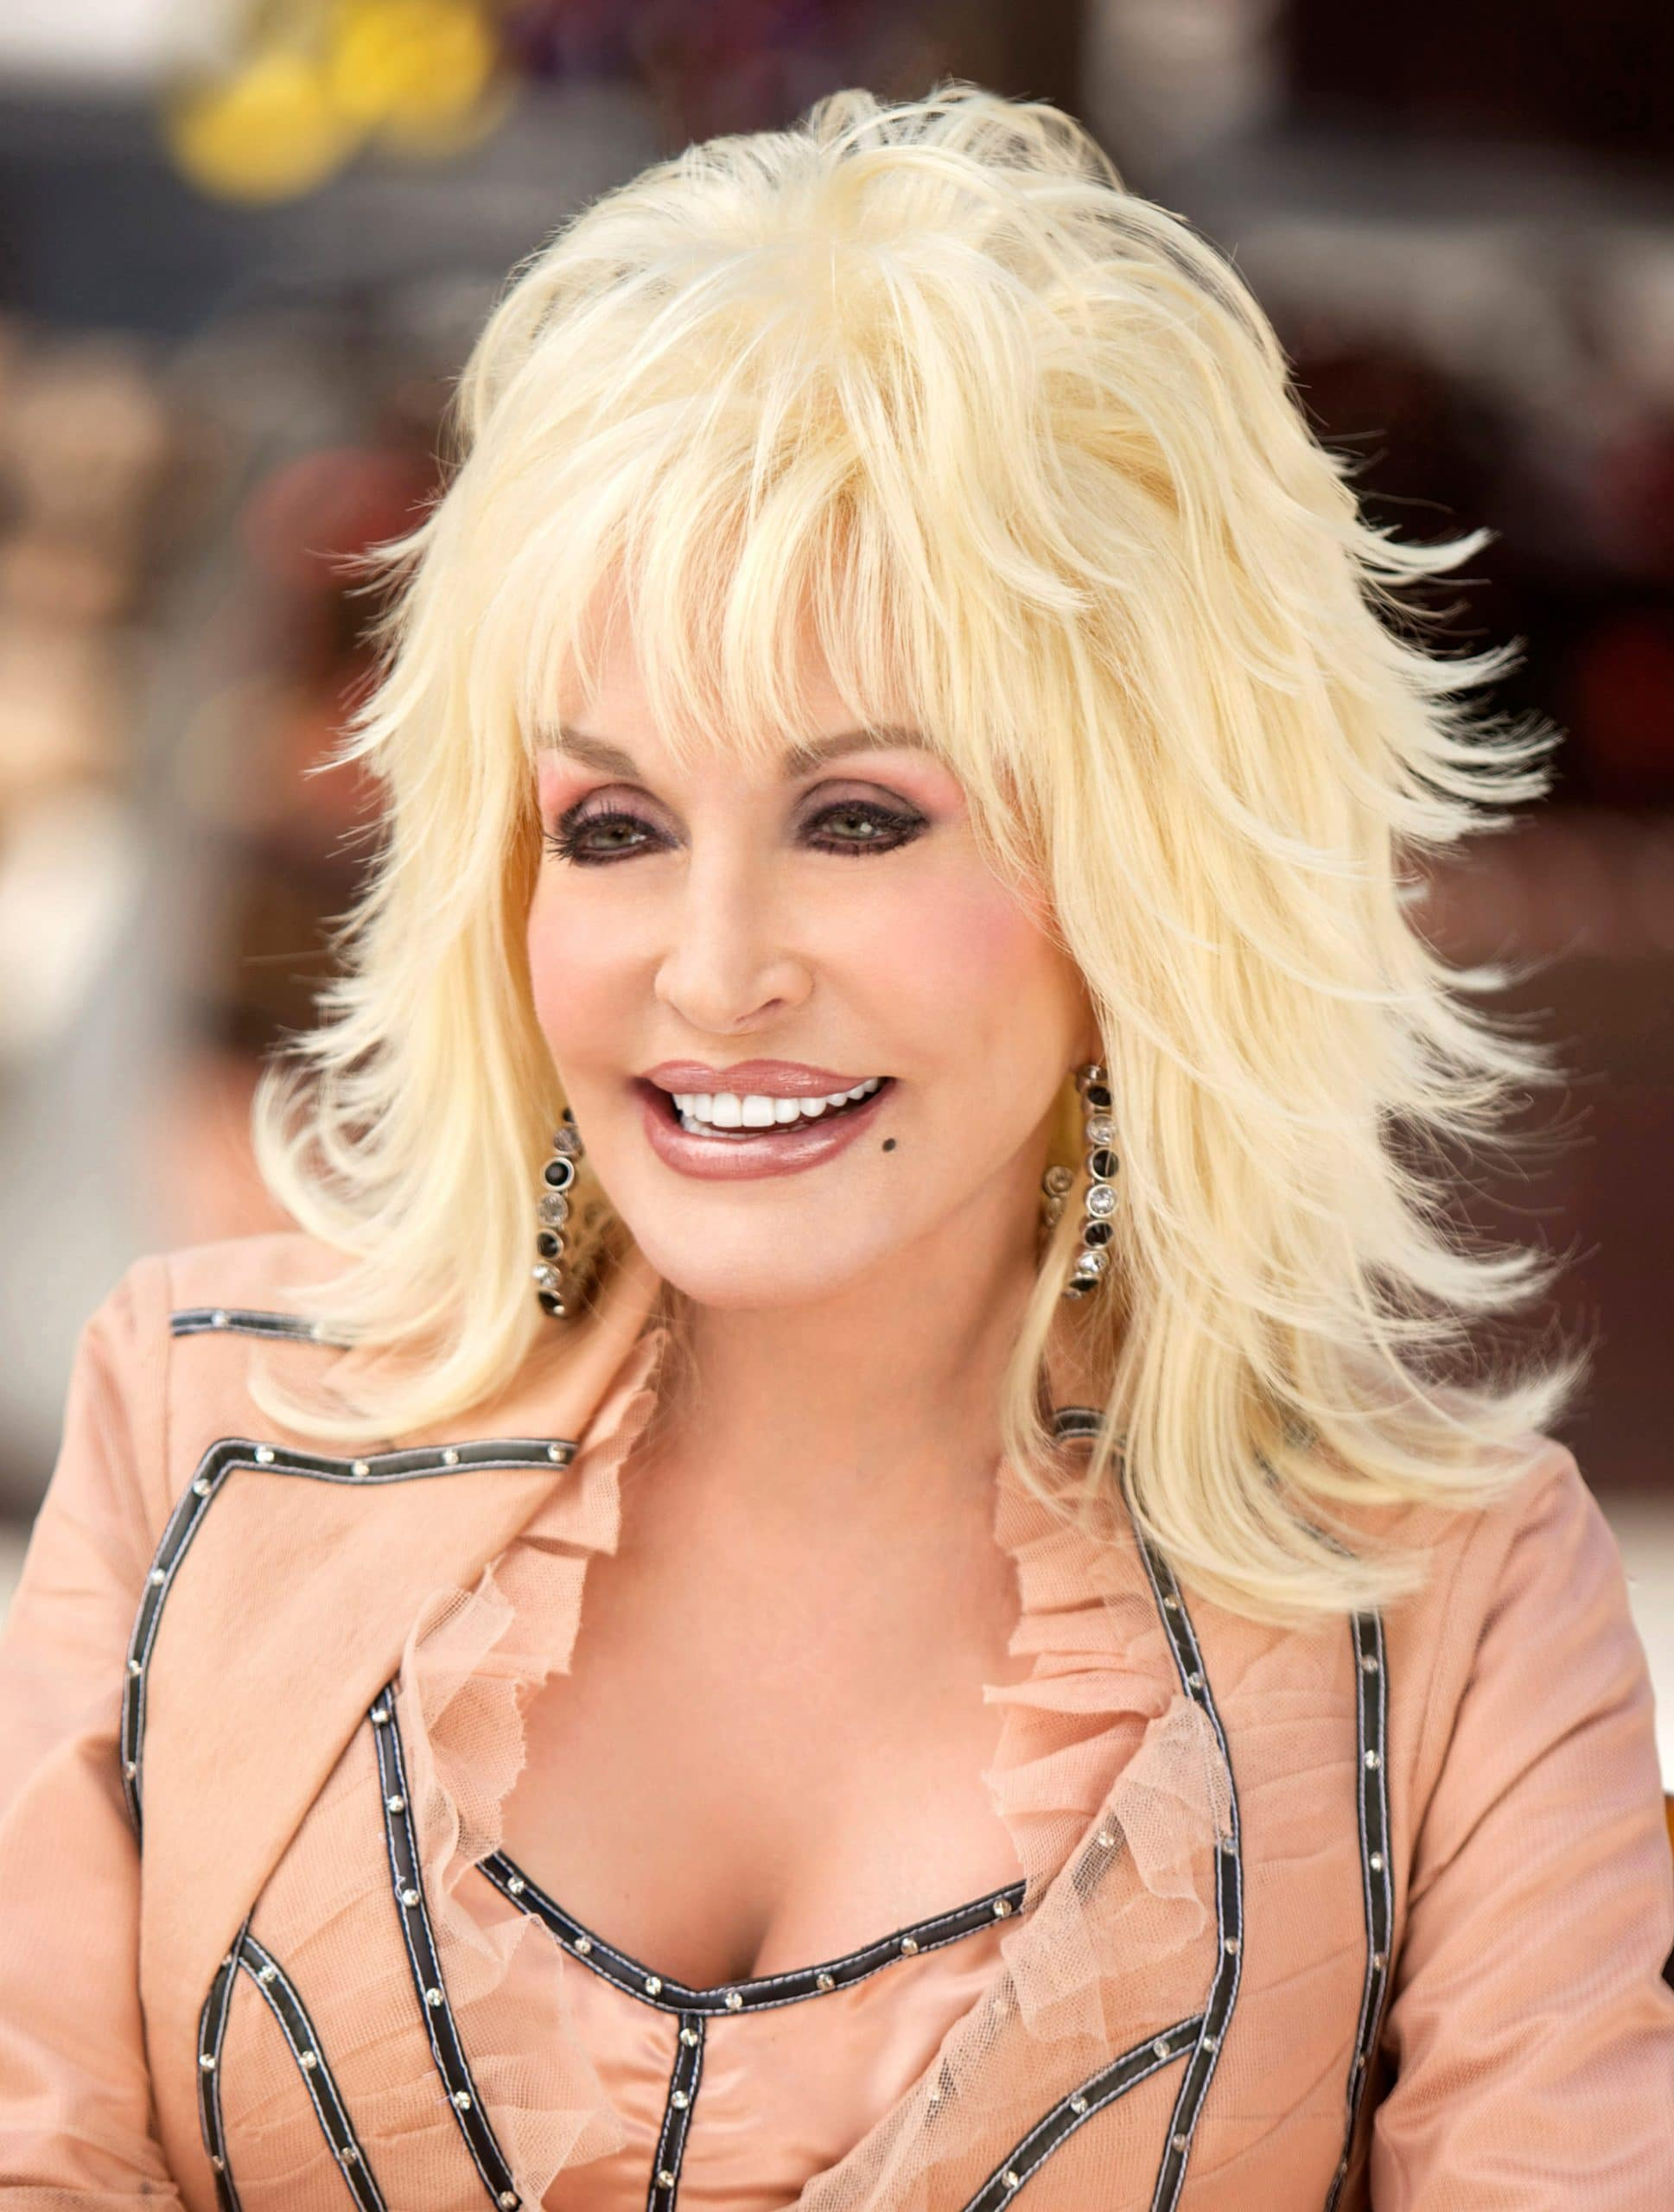 DOLLY CELEBRATES 25 YEARS OF DOLLYWOOD, Dolly Parton